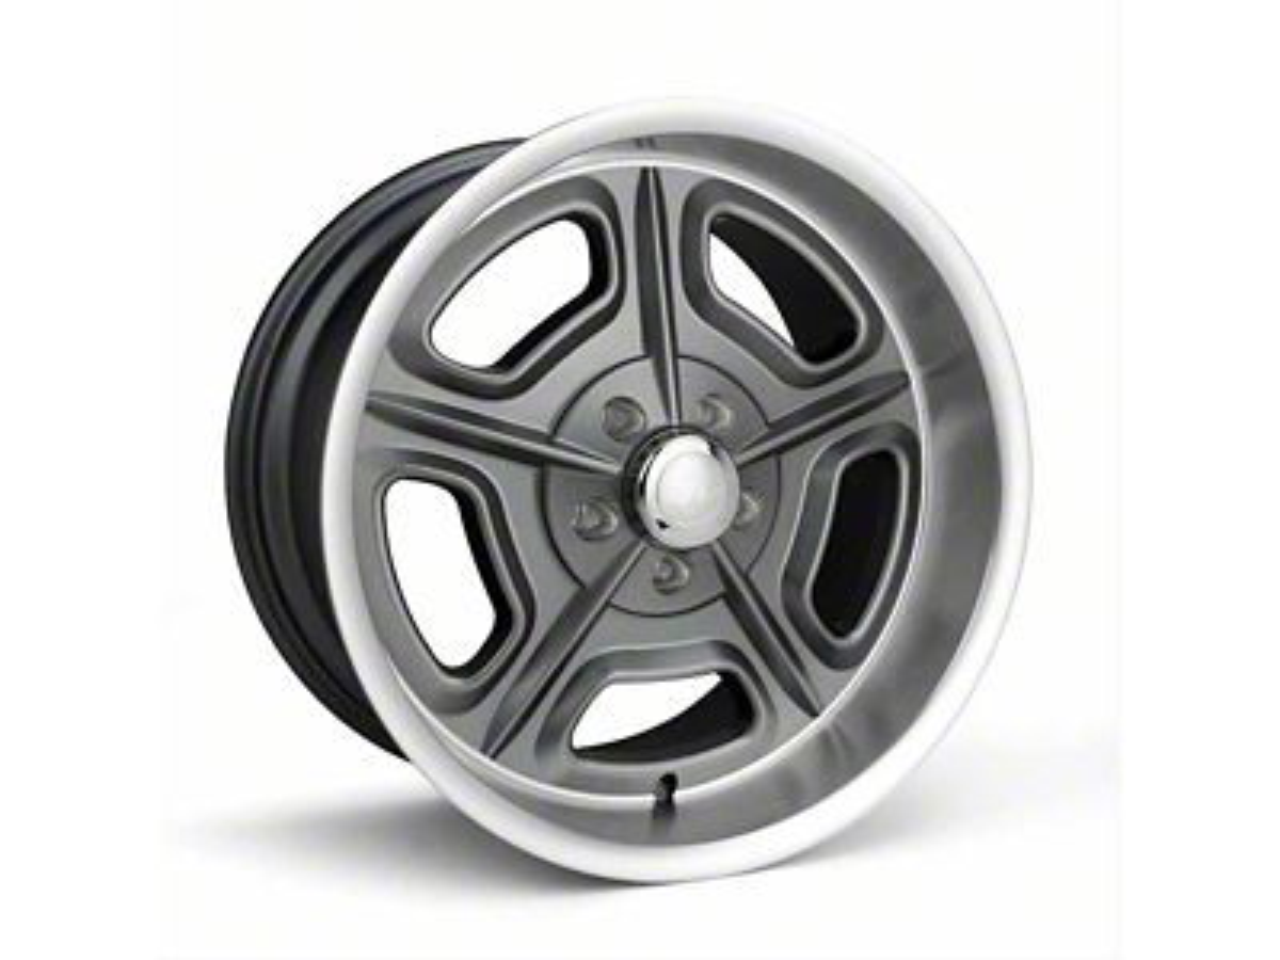 Race Star 32 Mirage Metallic Gray Wheel - 18x7 (87-93 w/ 5 Lug Conversion)